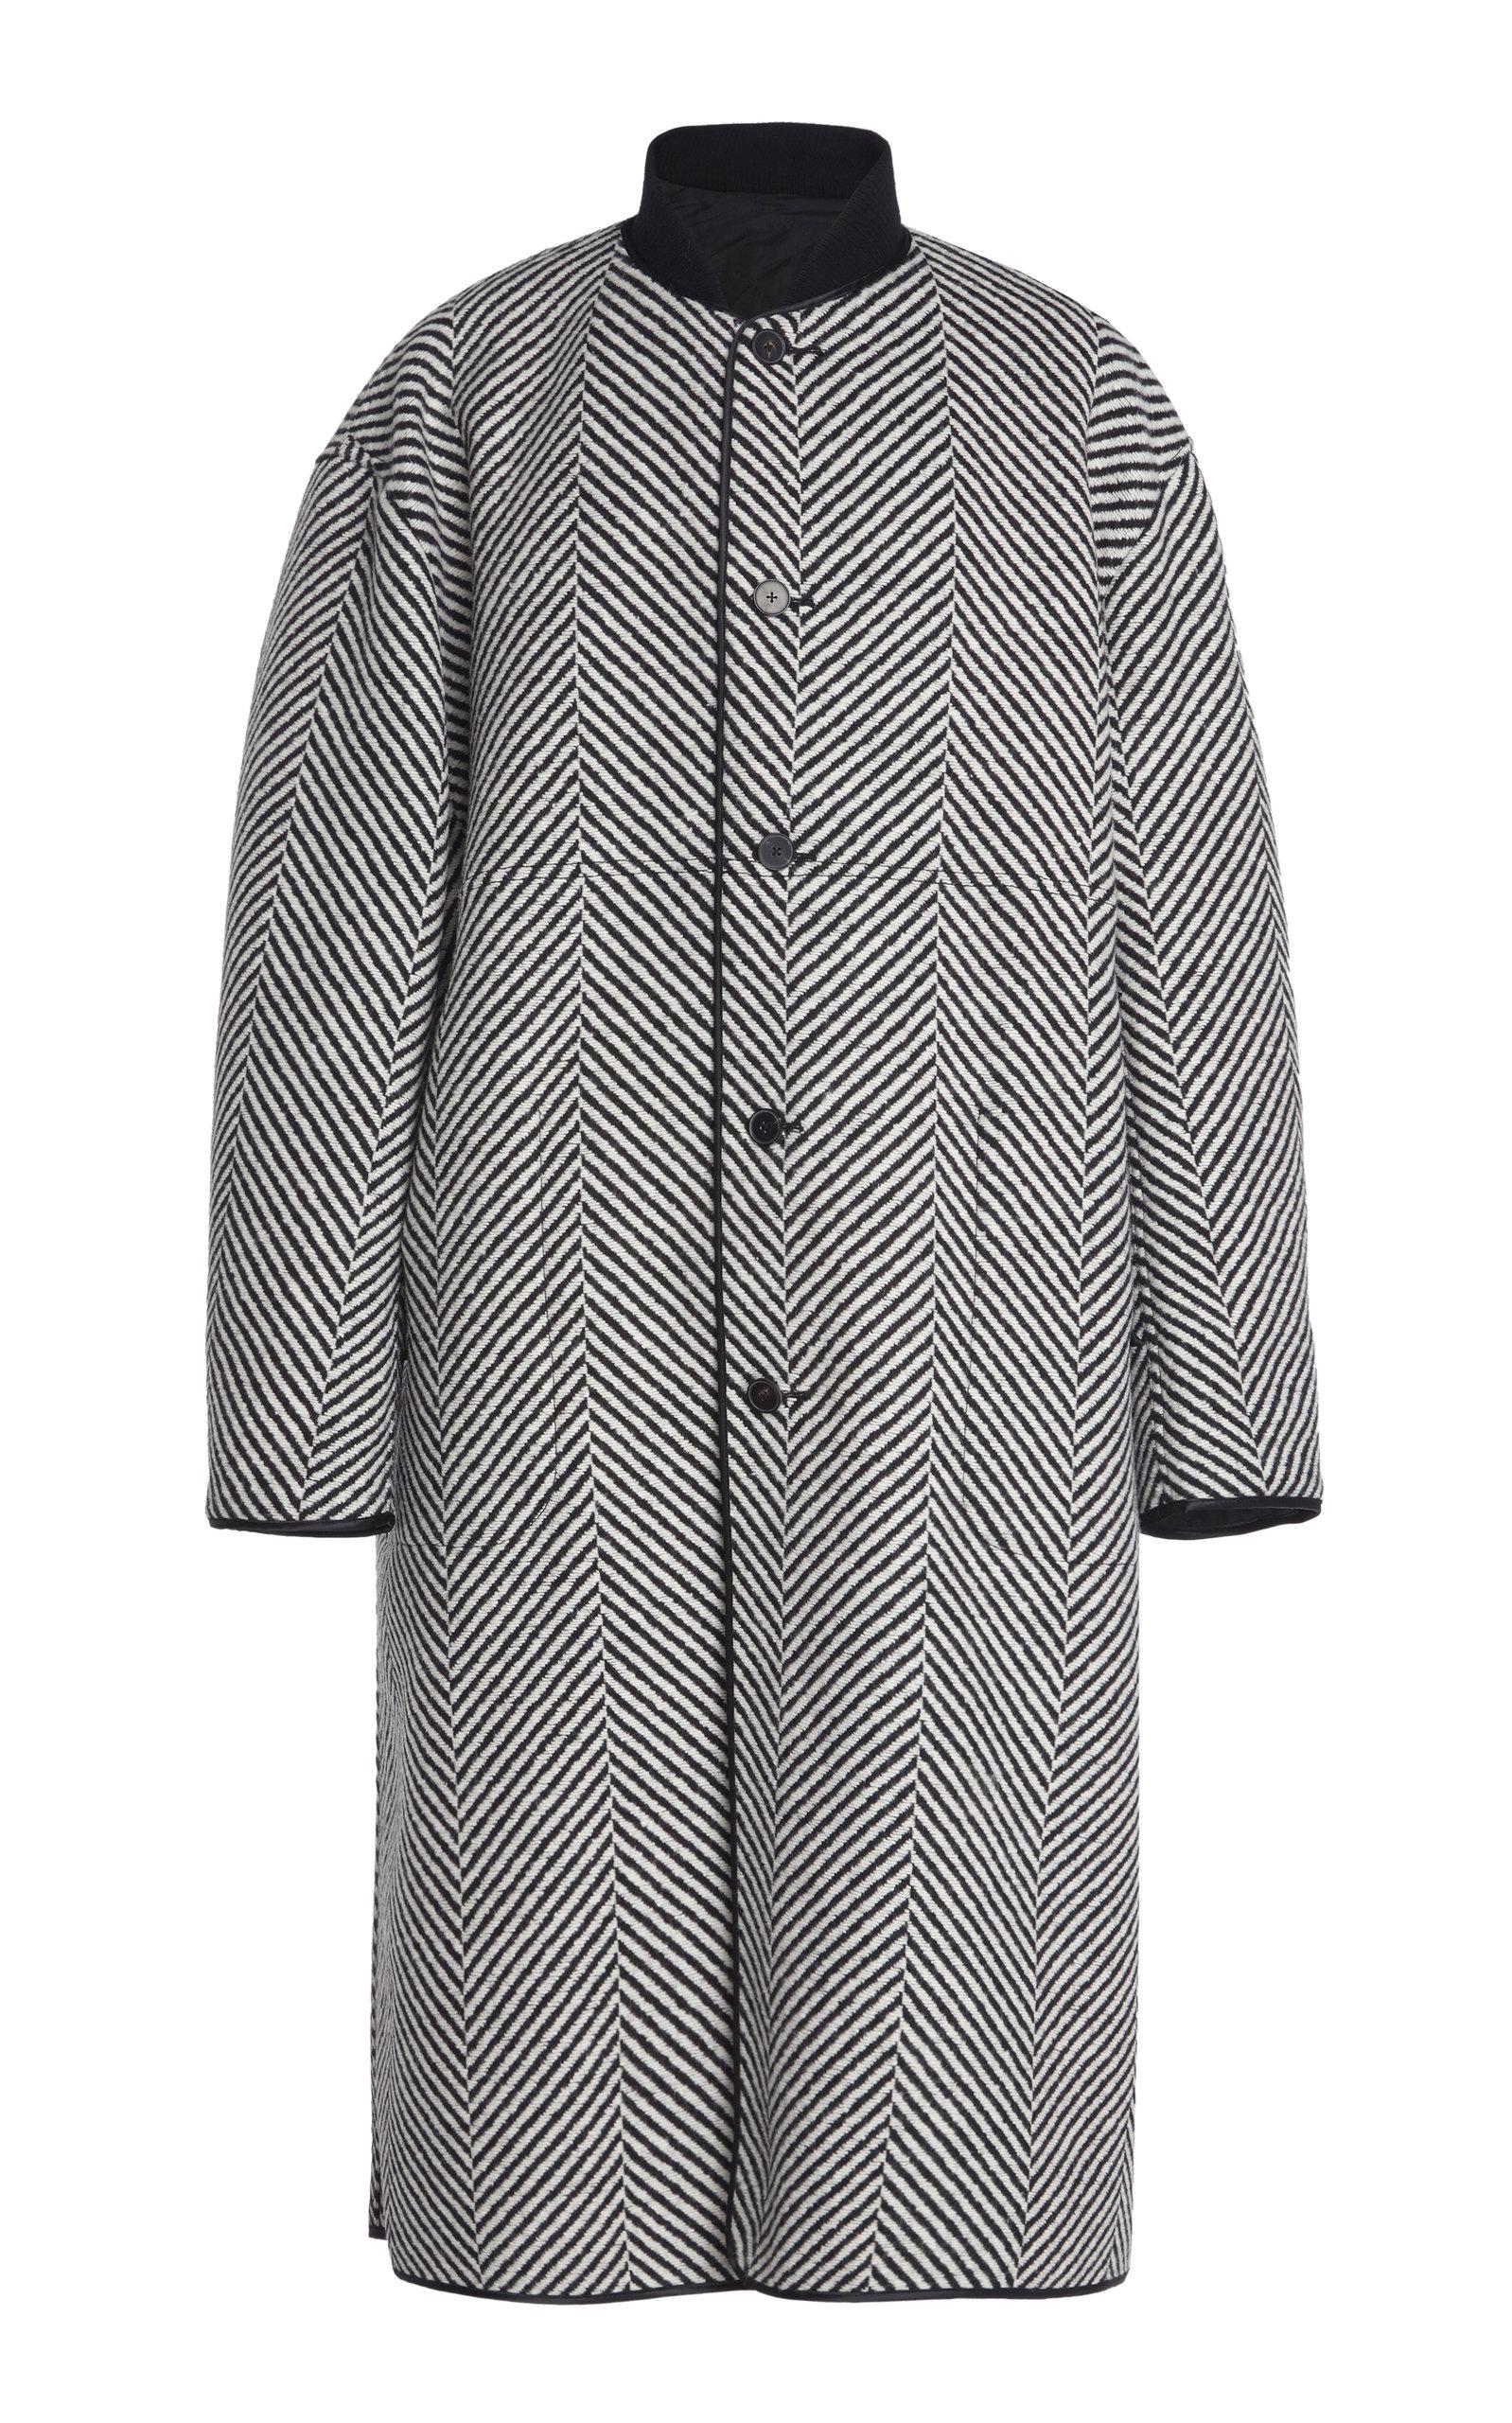 Haider Ackermann Coats REVERSIBLE HERRINGBONE WOOL COAT